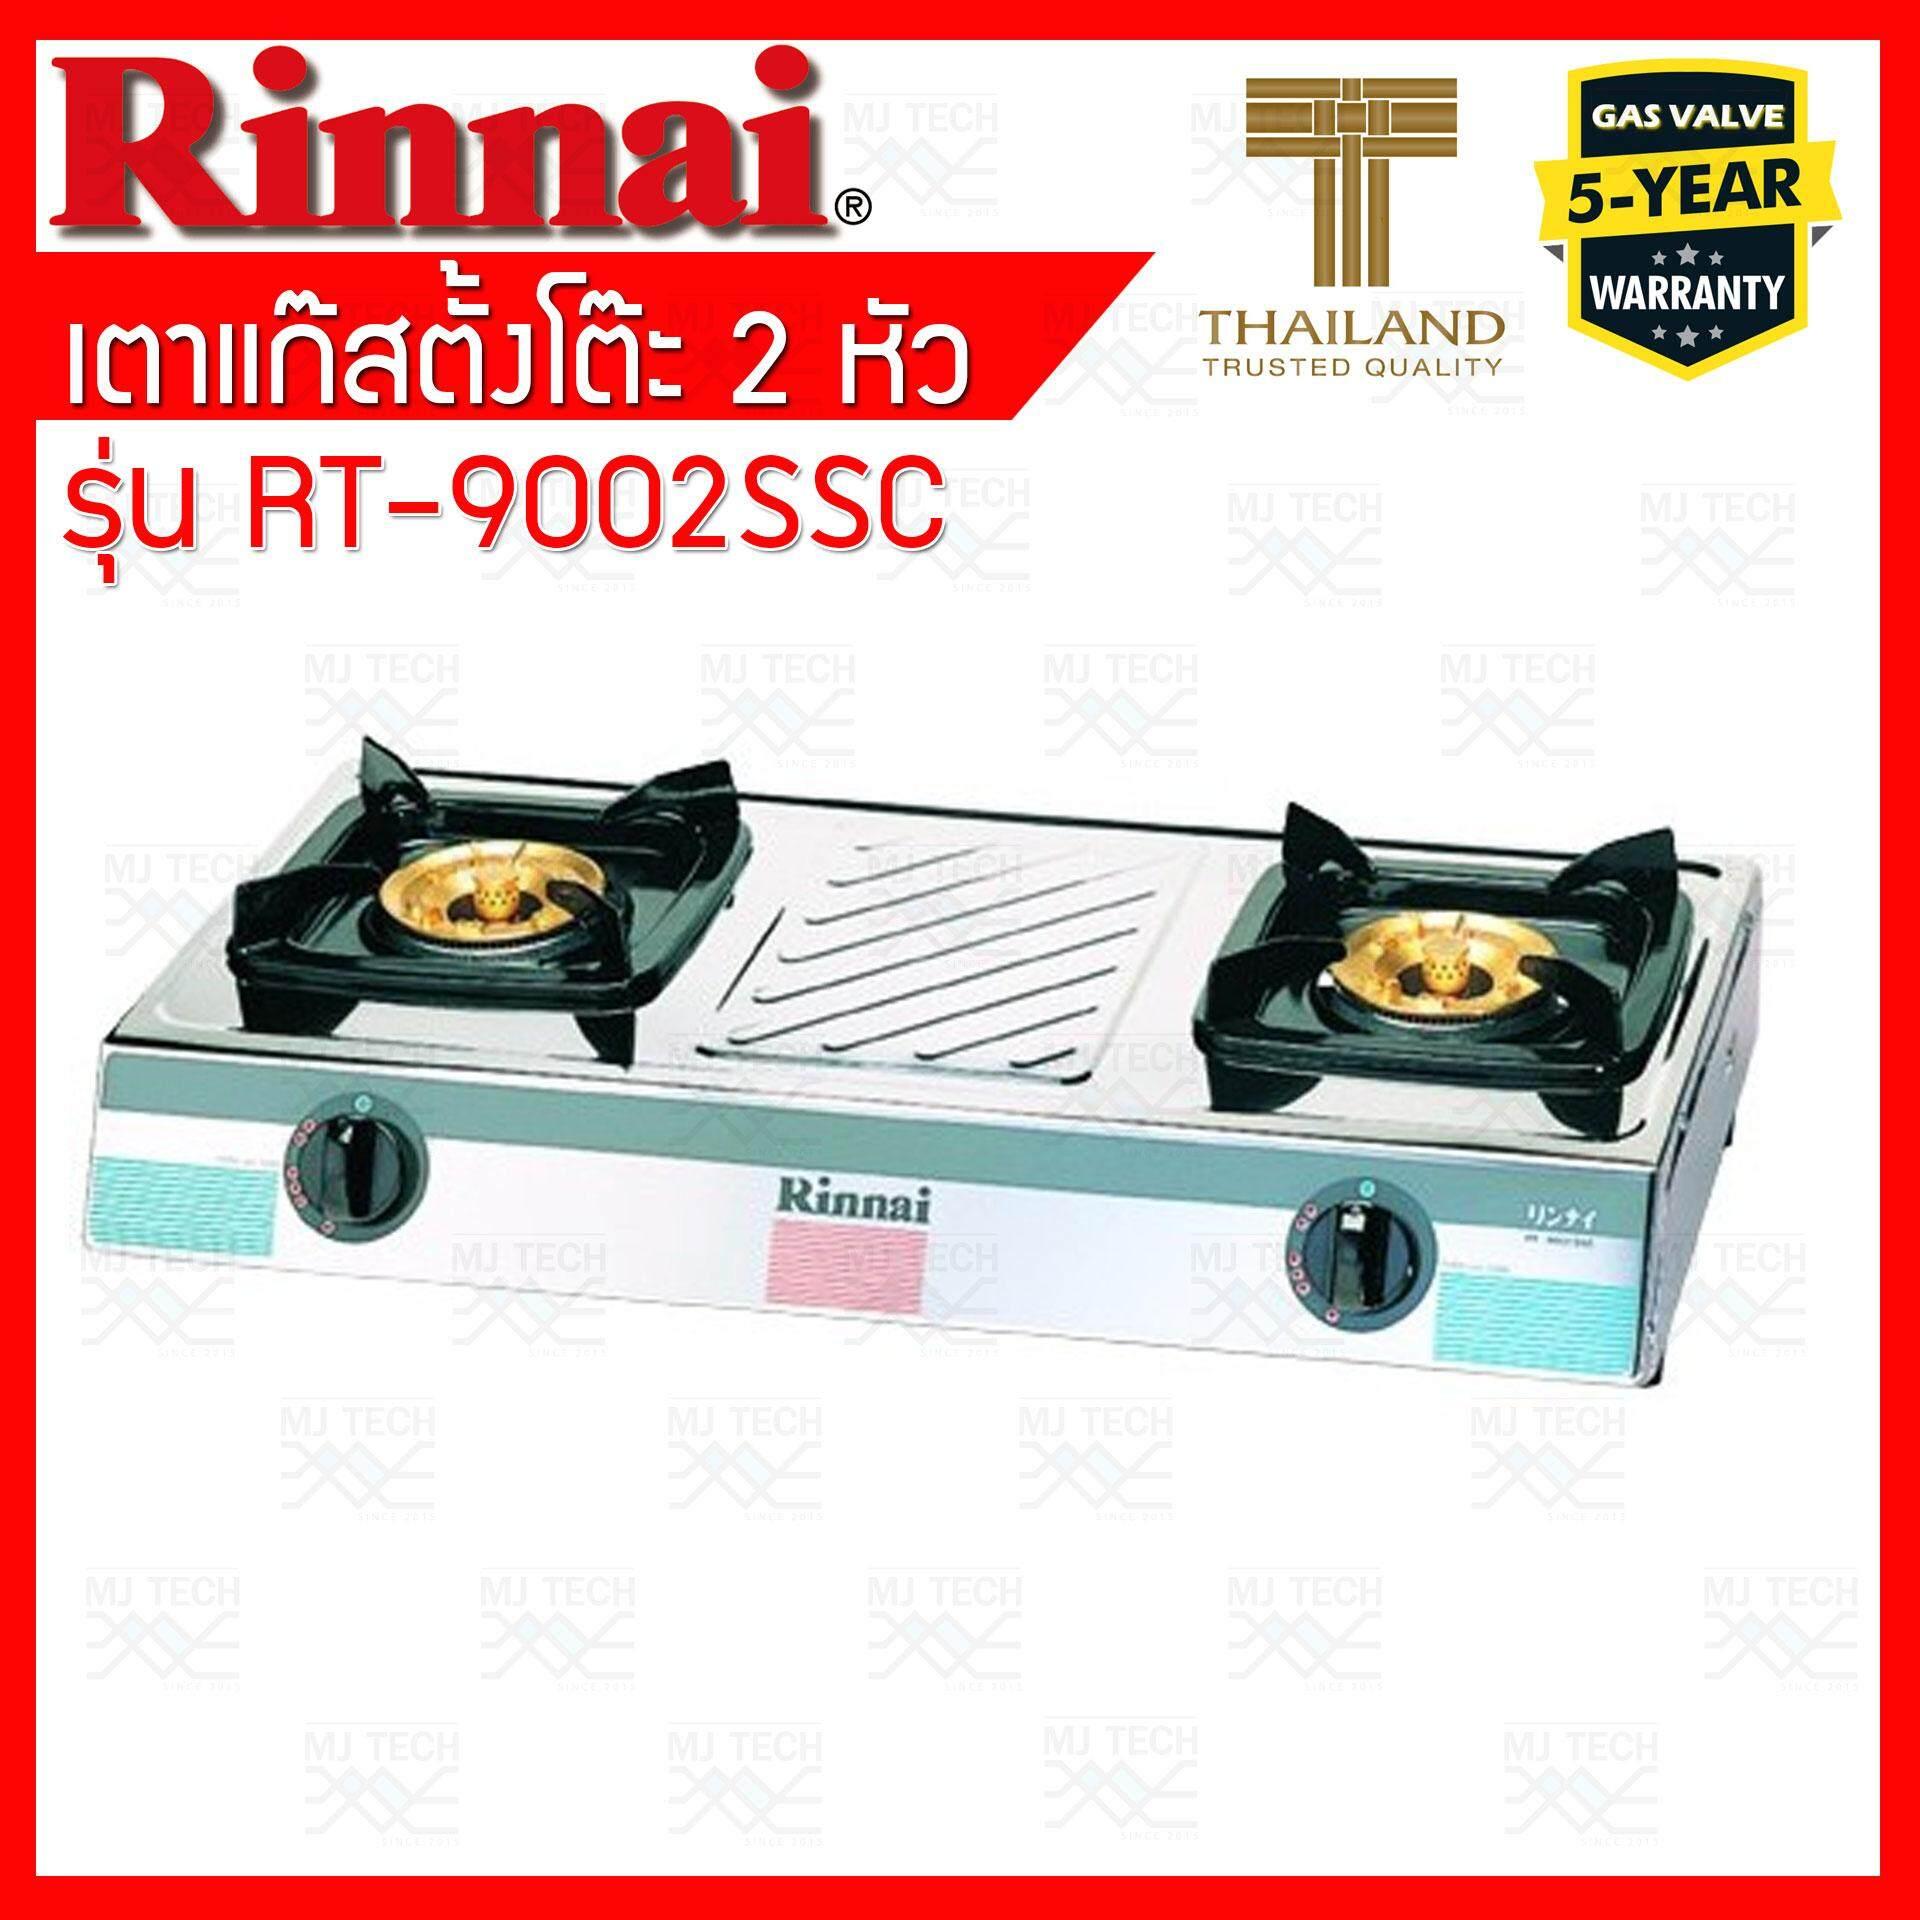 Rinnai เตาแก๊ส 2 เตา หัวเตาทองเหลือง รุ่น RY-9002SSC